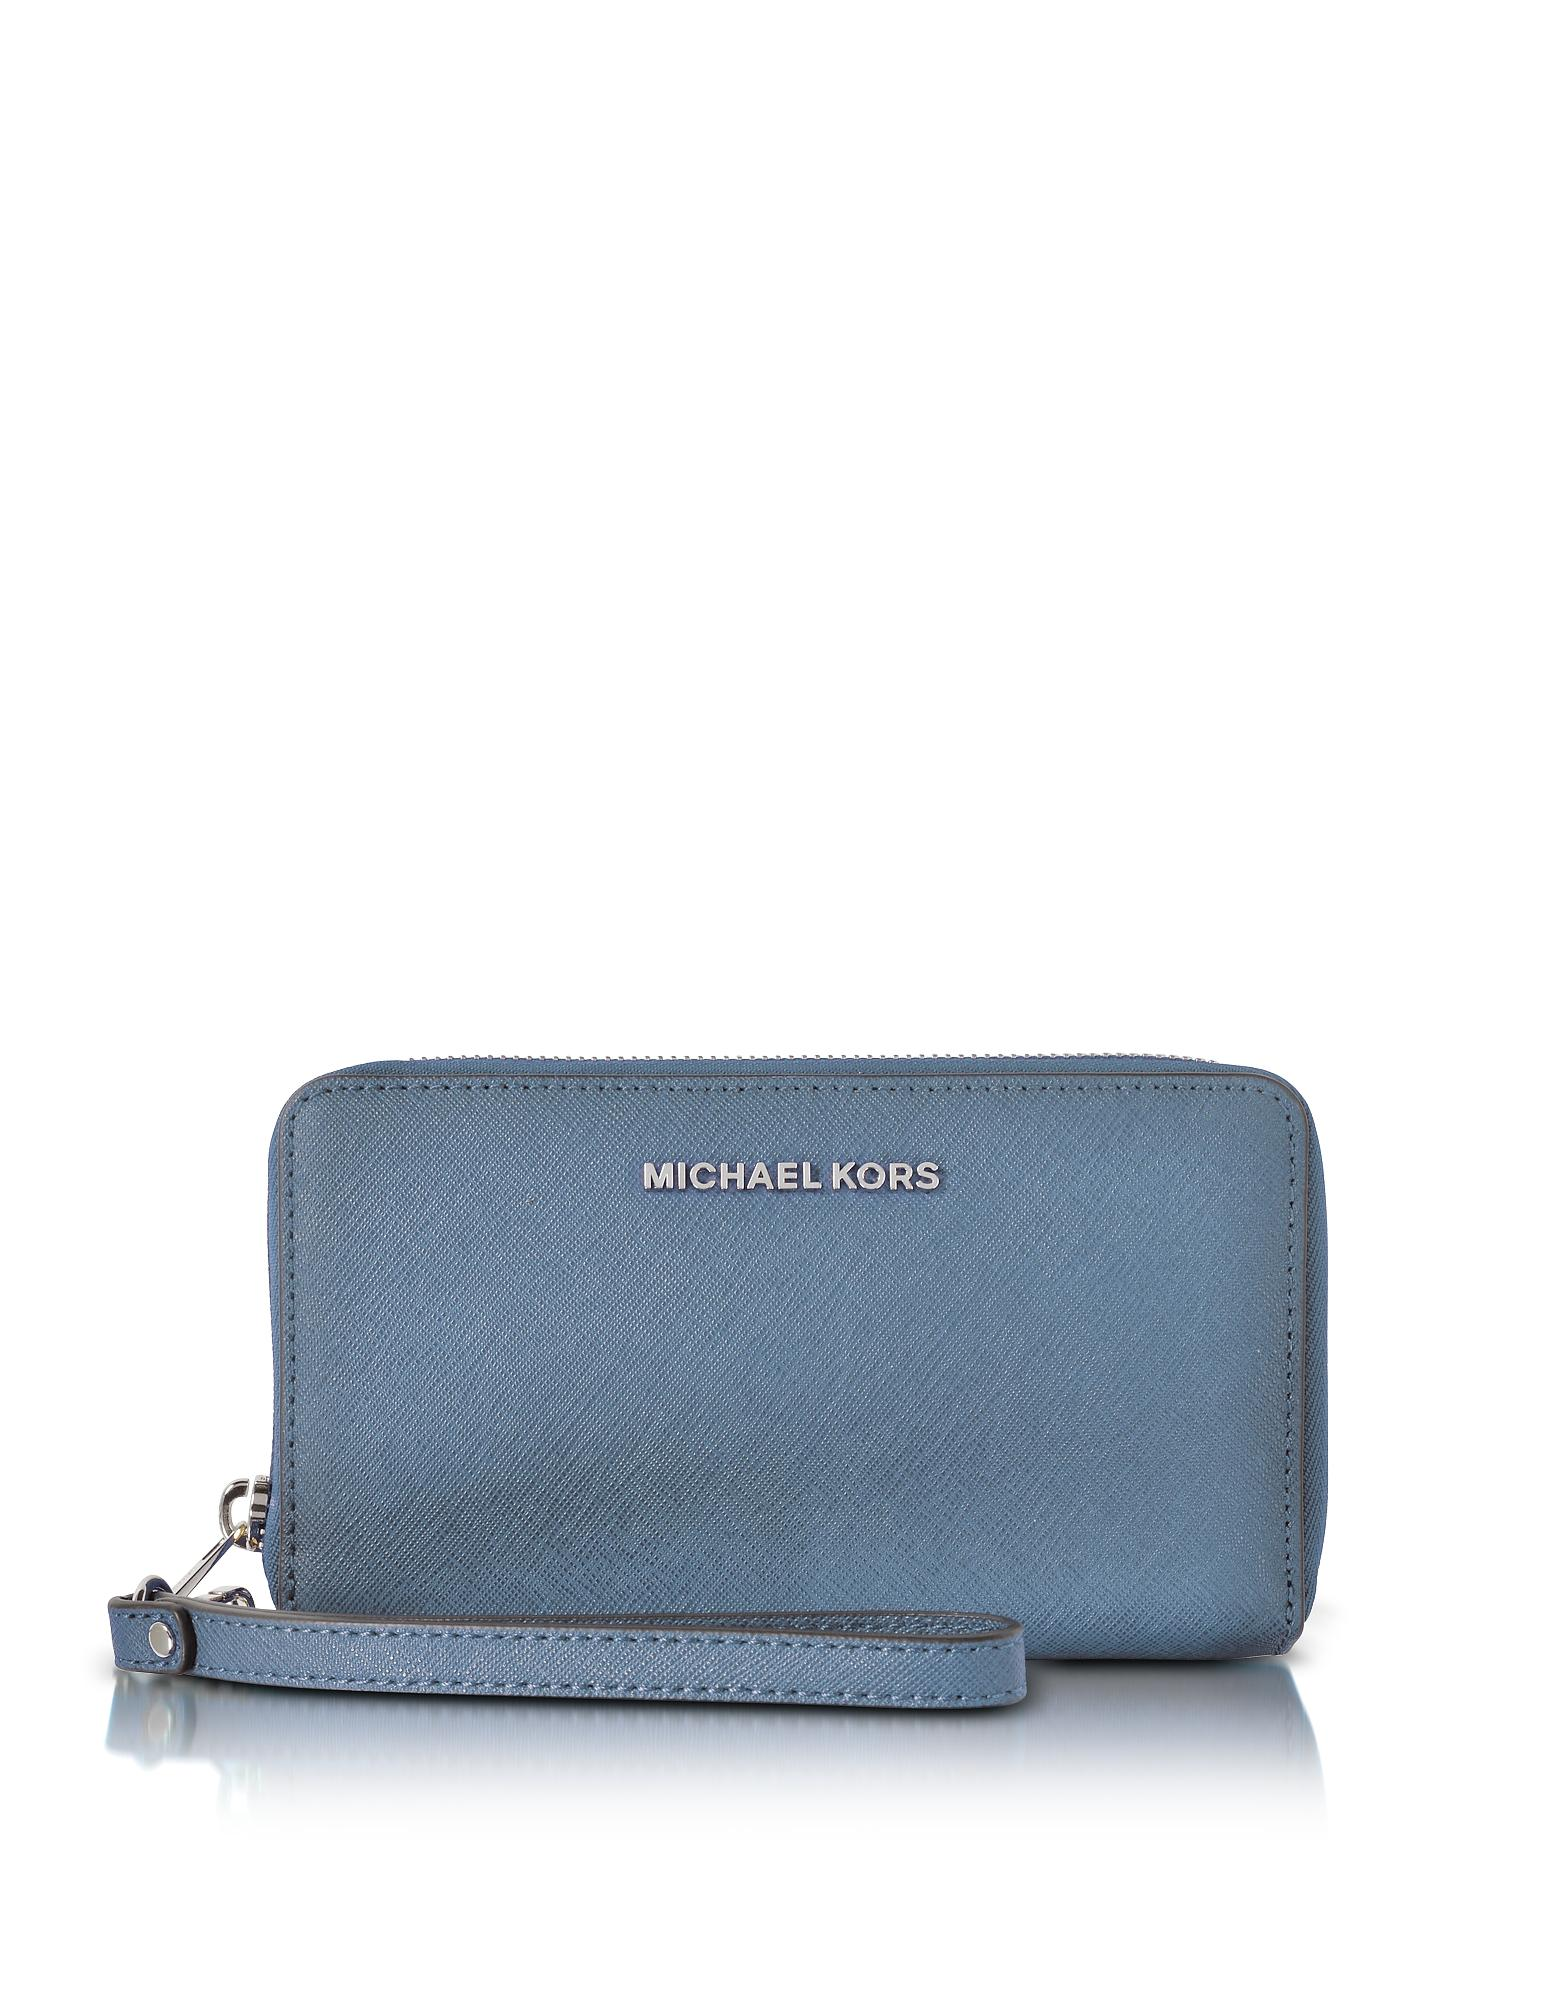 46bb7877307b Michael Kors Wallet Denim. Michael kors Jet Set Travel Large Flat Mf Denim Saffiano  Leather Phone Case/wallet in